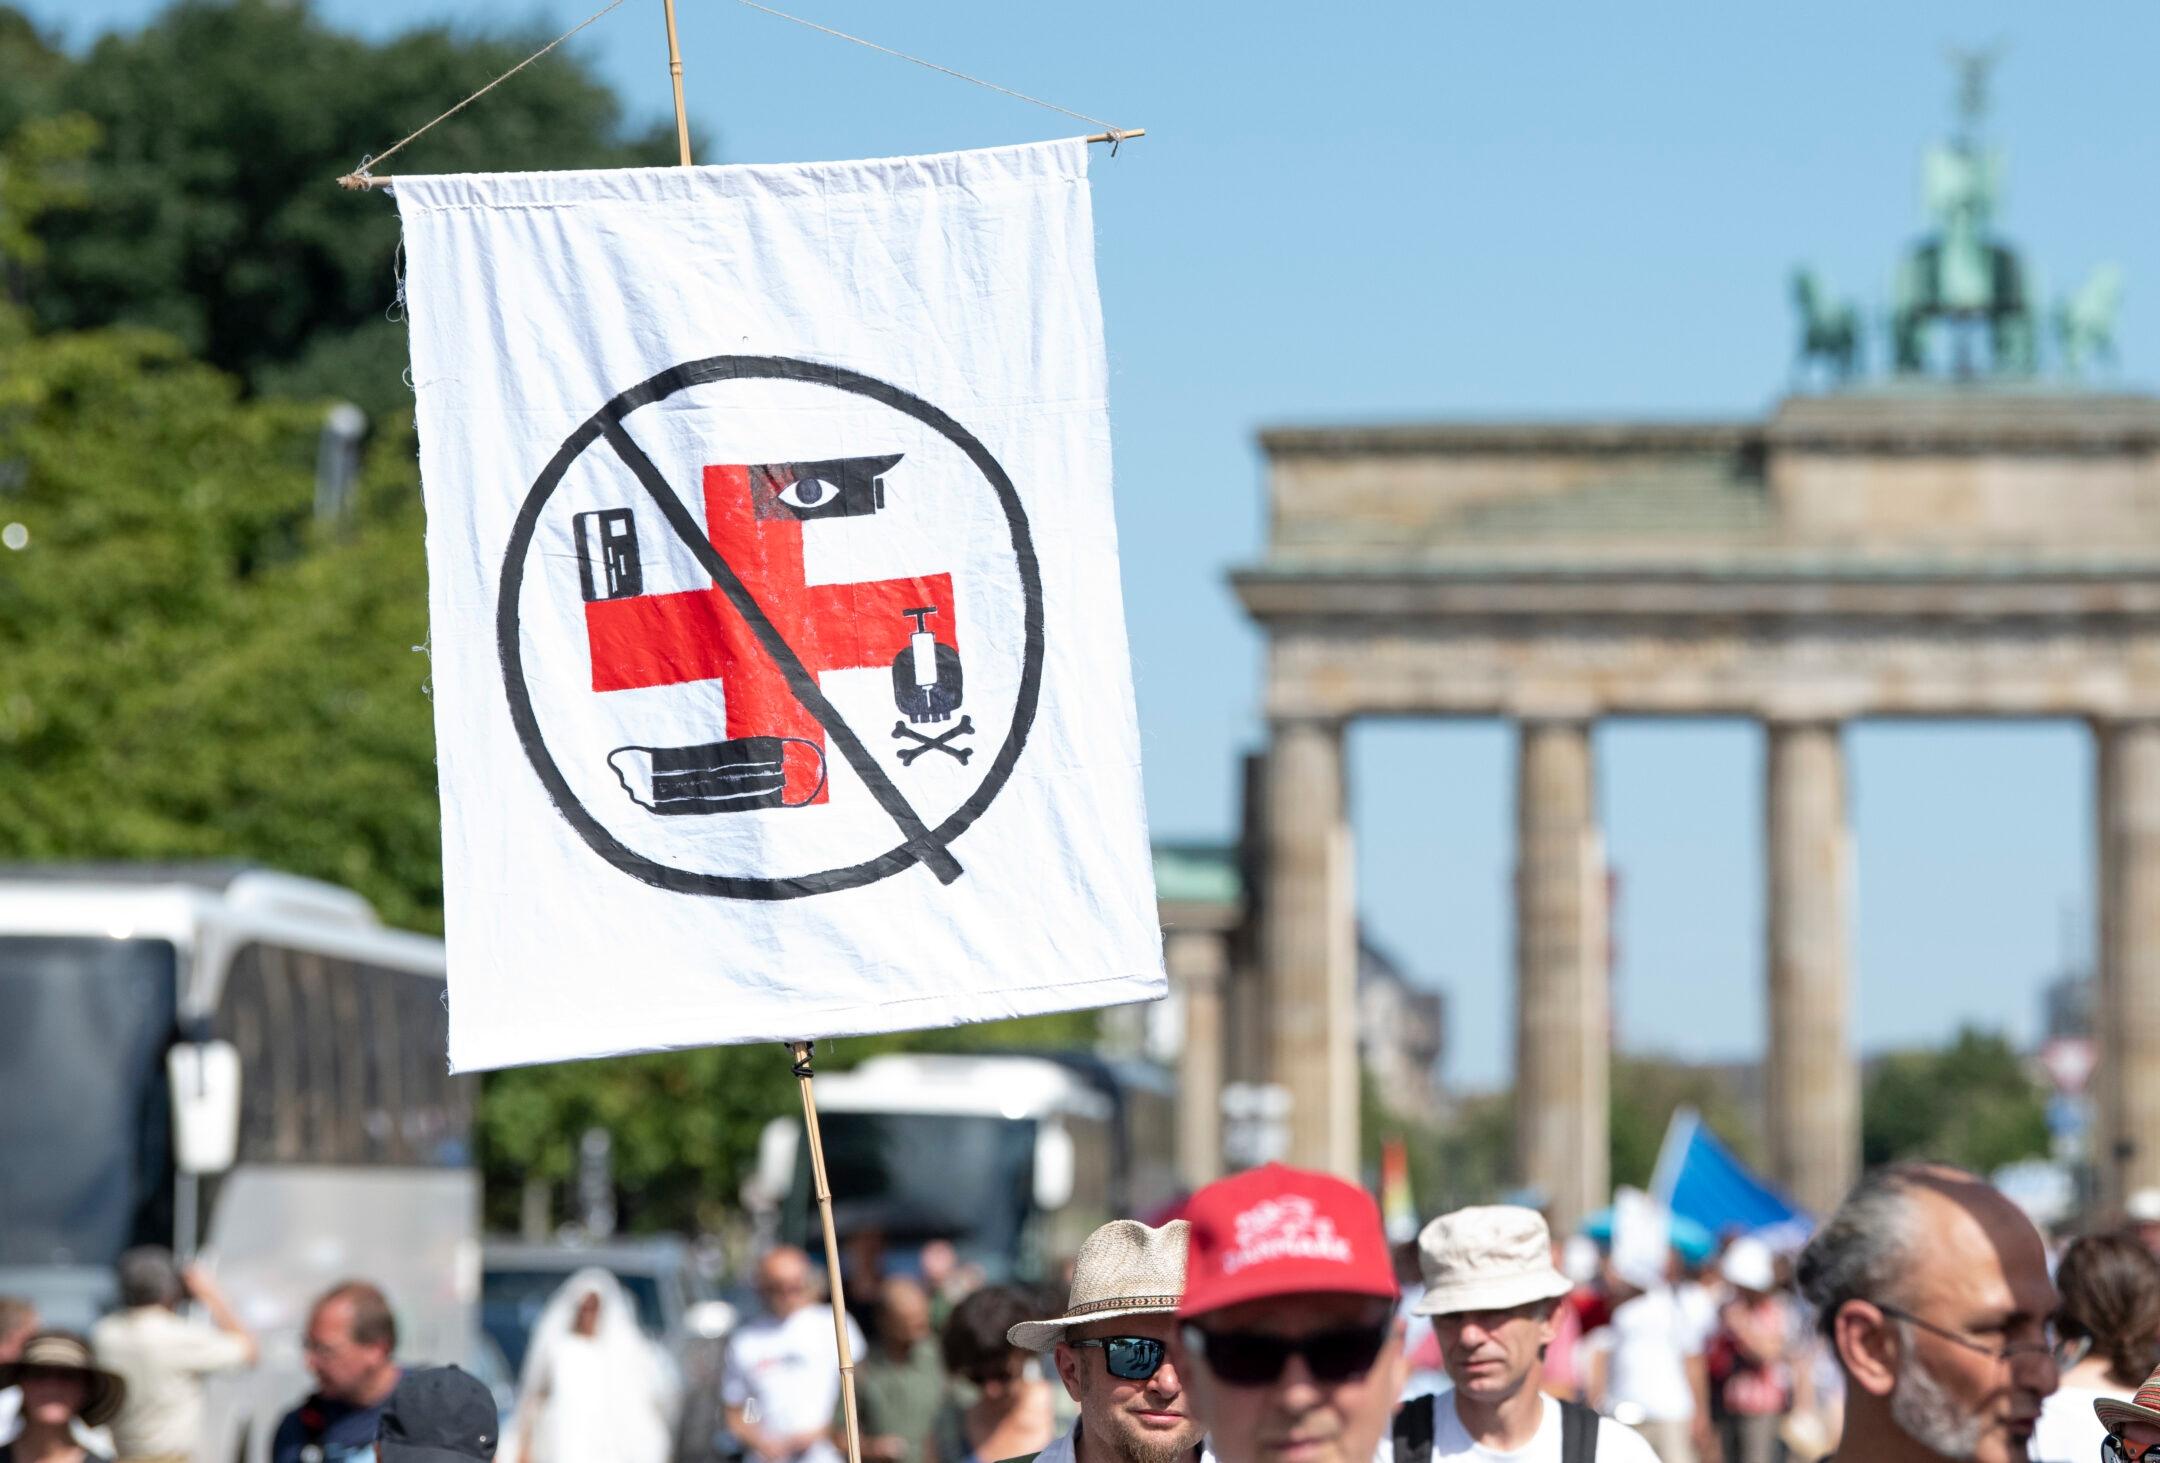 Berlin rally against coronavirus rules features neo-Nazi supporters, anti-Semitic displays